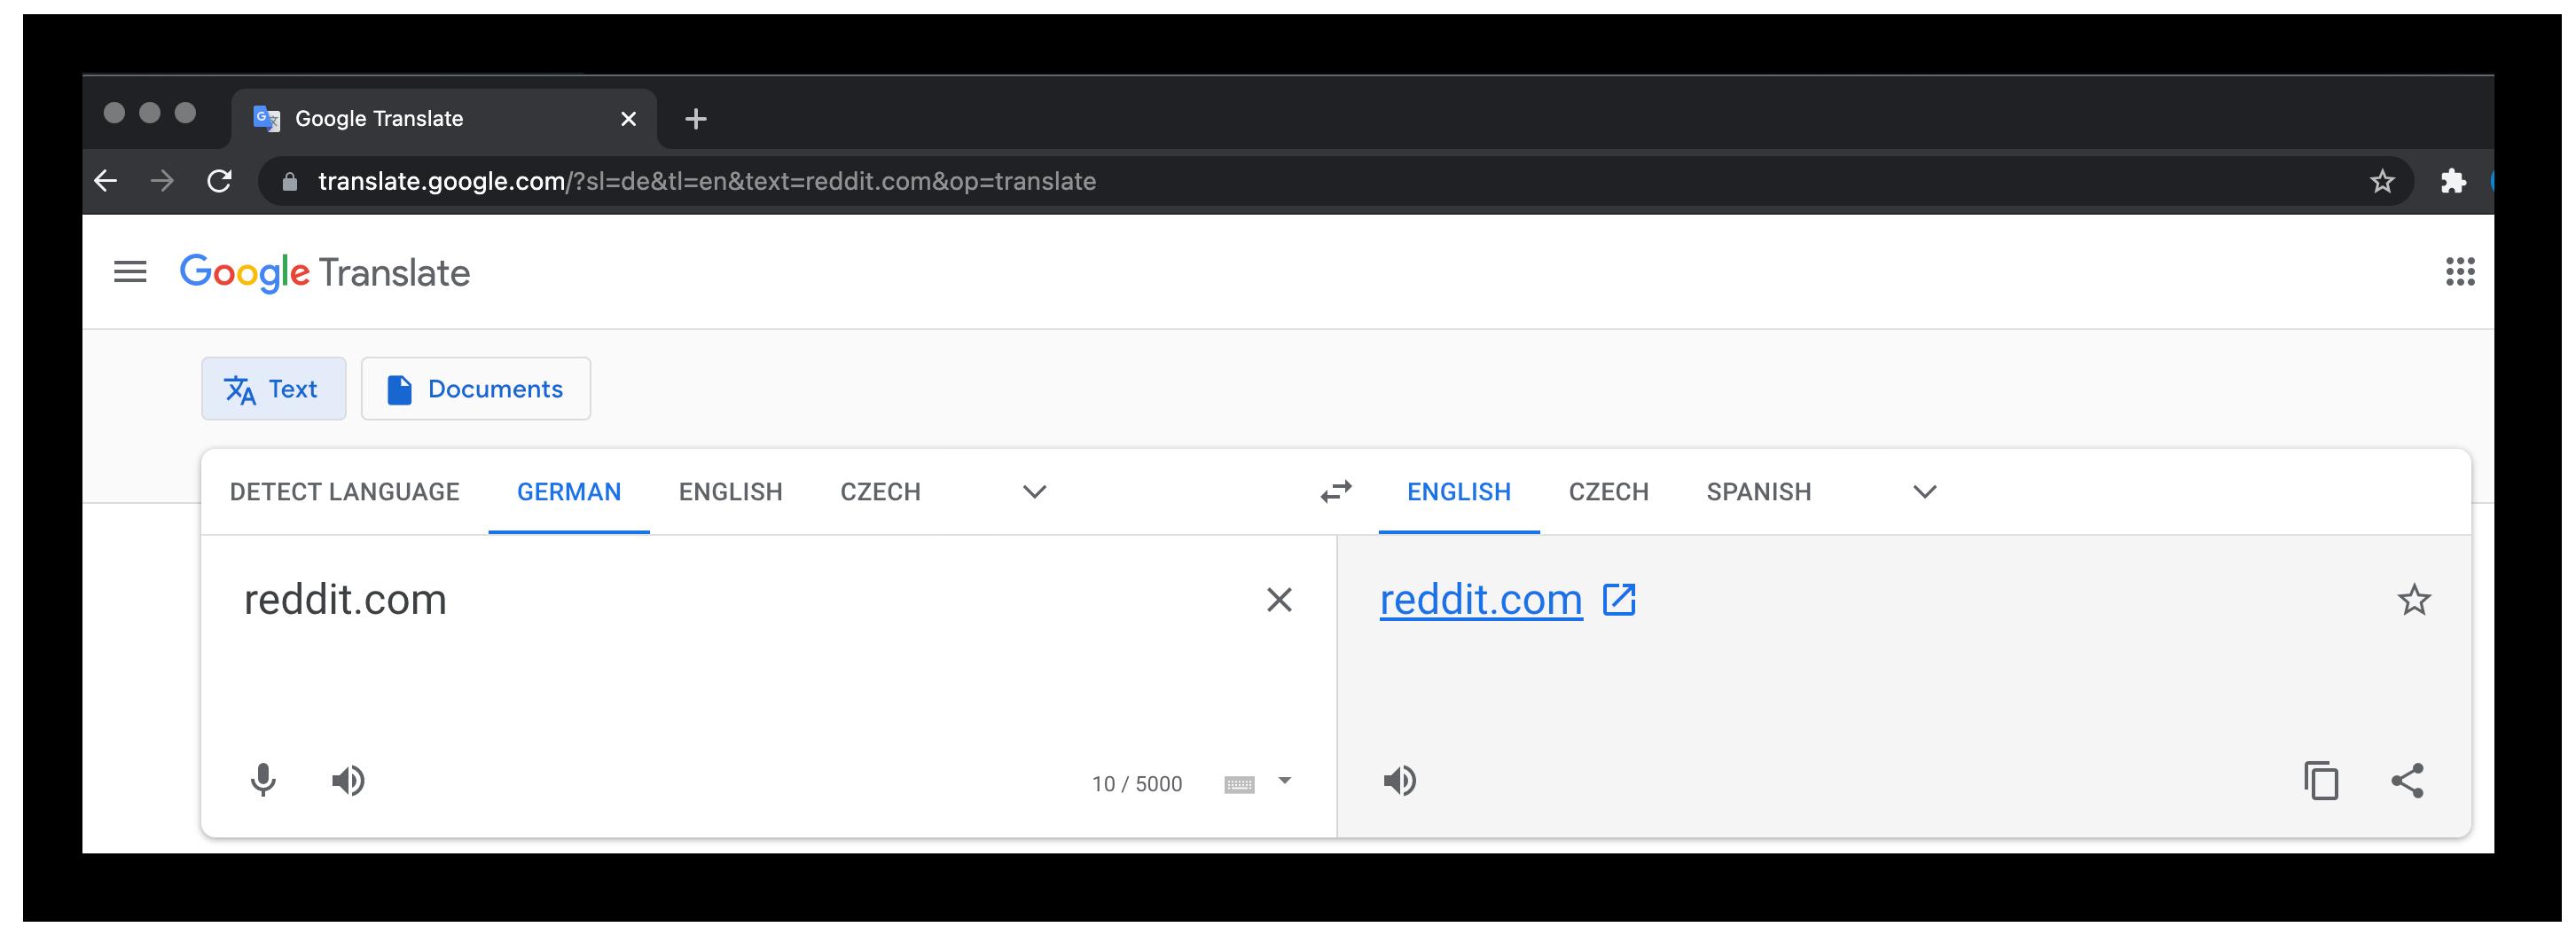 Using Google translate can help unblock websites.